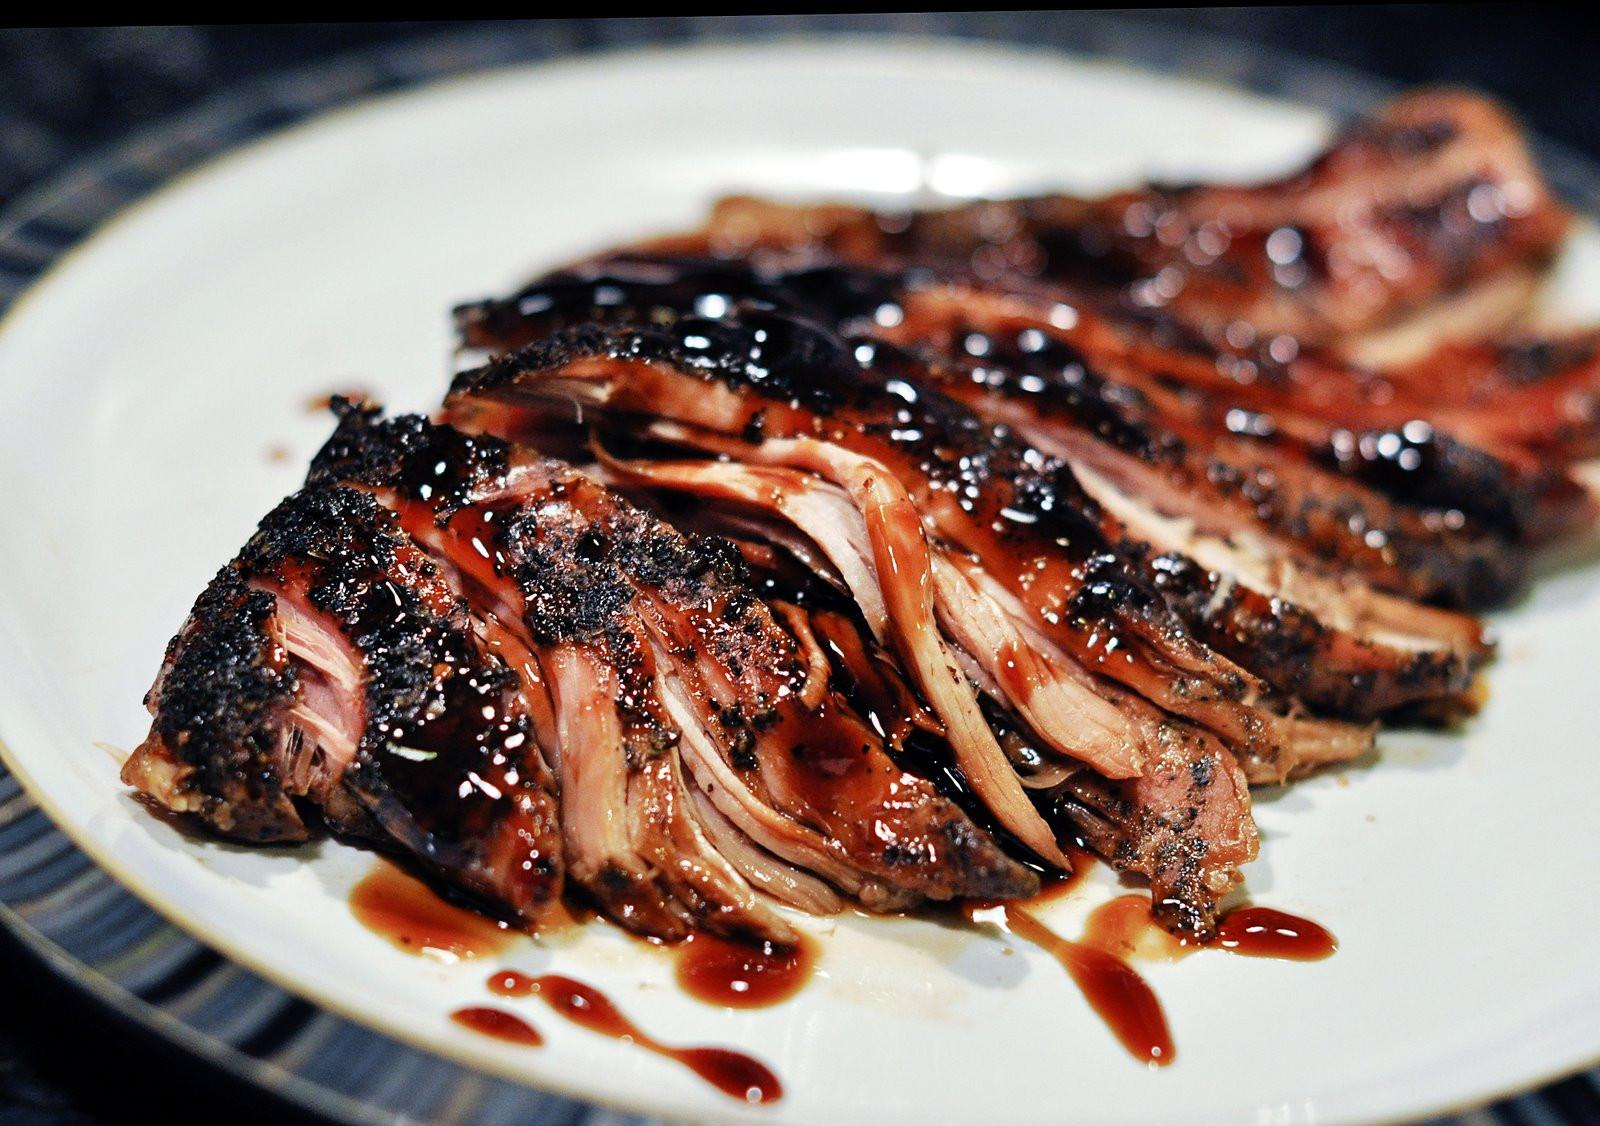 Pork Tenderloin In Crock Pot  crock pot brown sugar and balsamic glazed pork loin